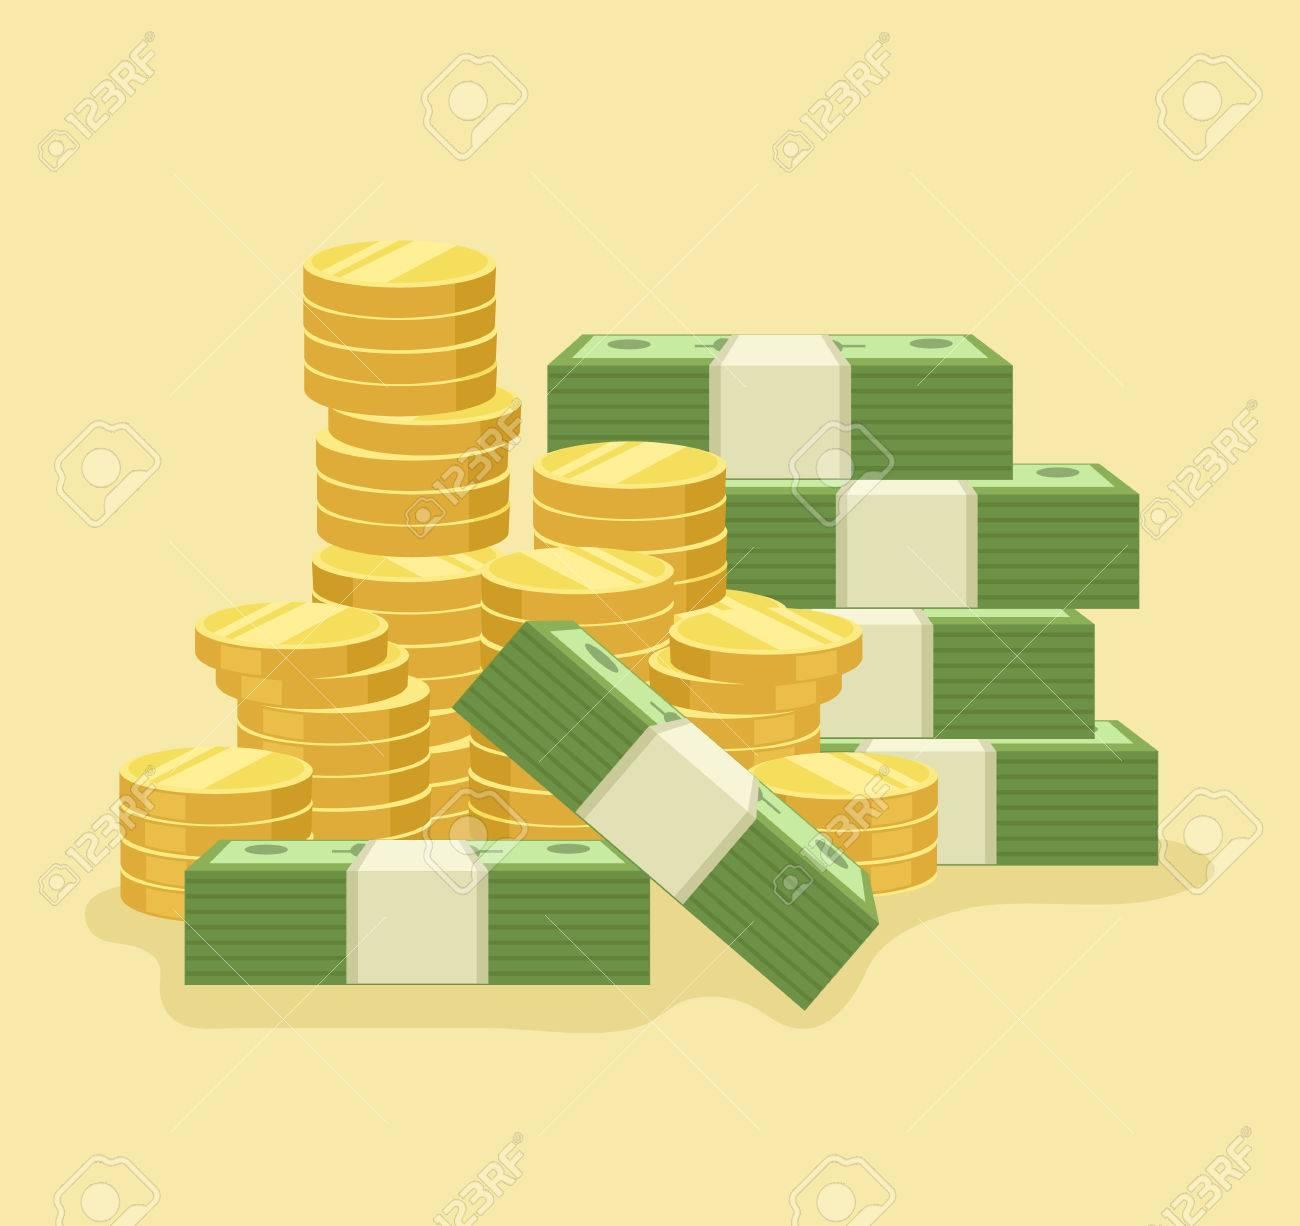 Lot of money. Vector flat cartoon icon illustration - 59433230